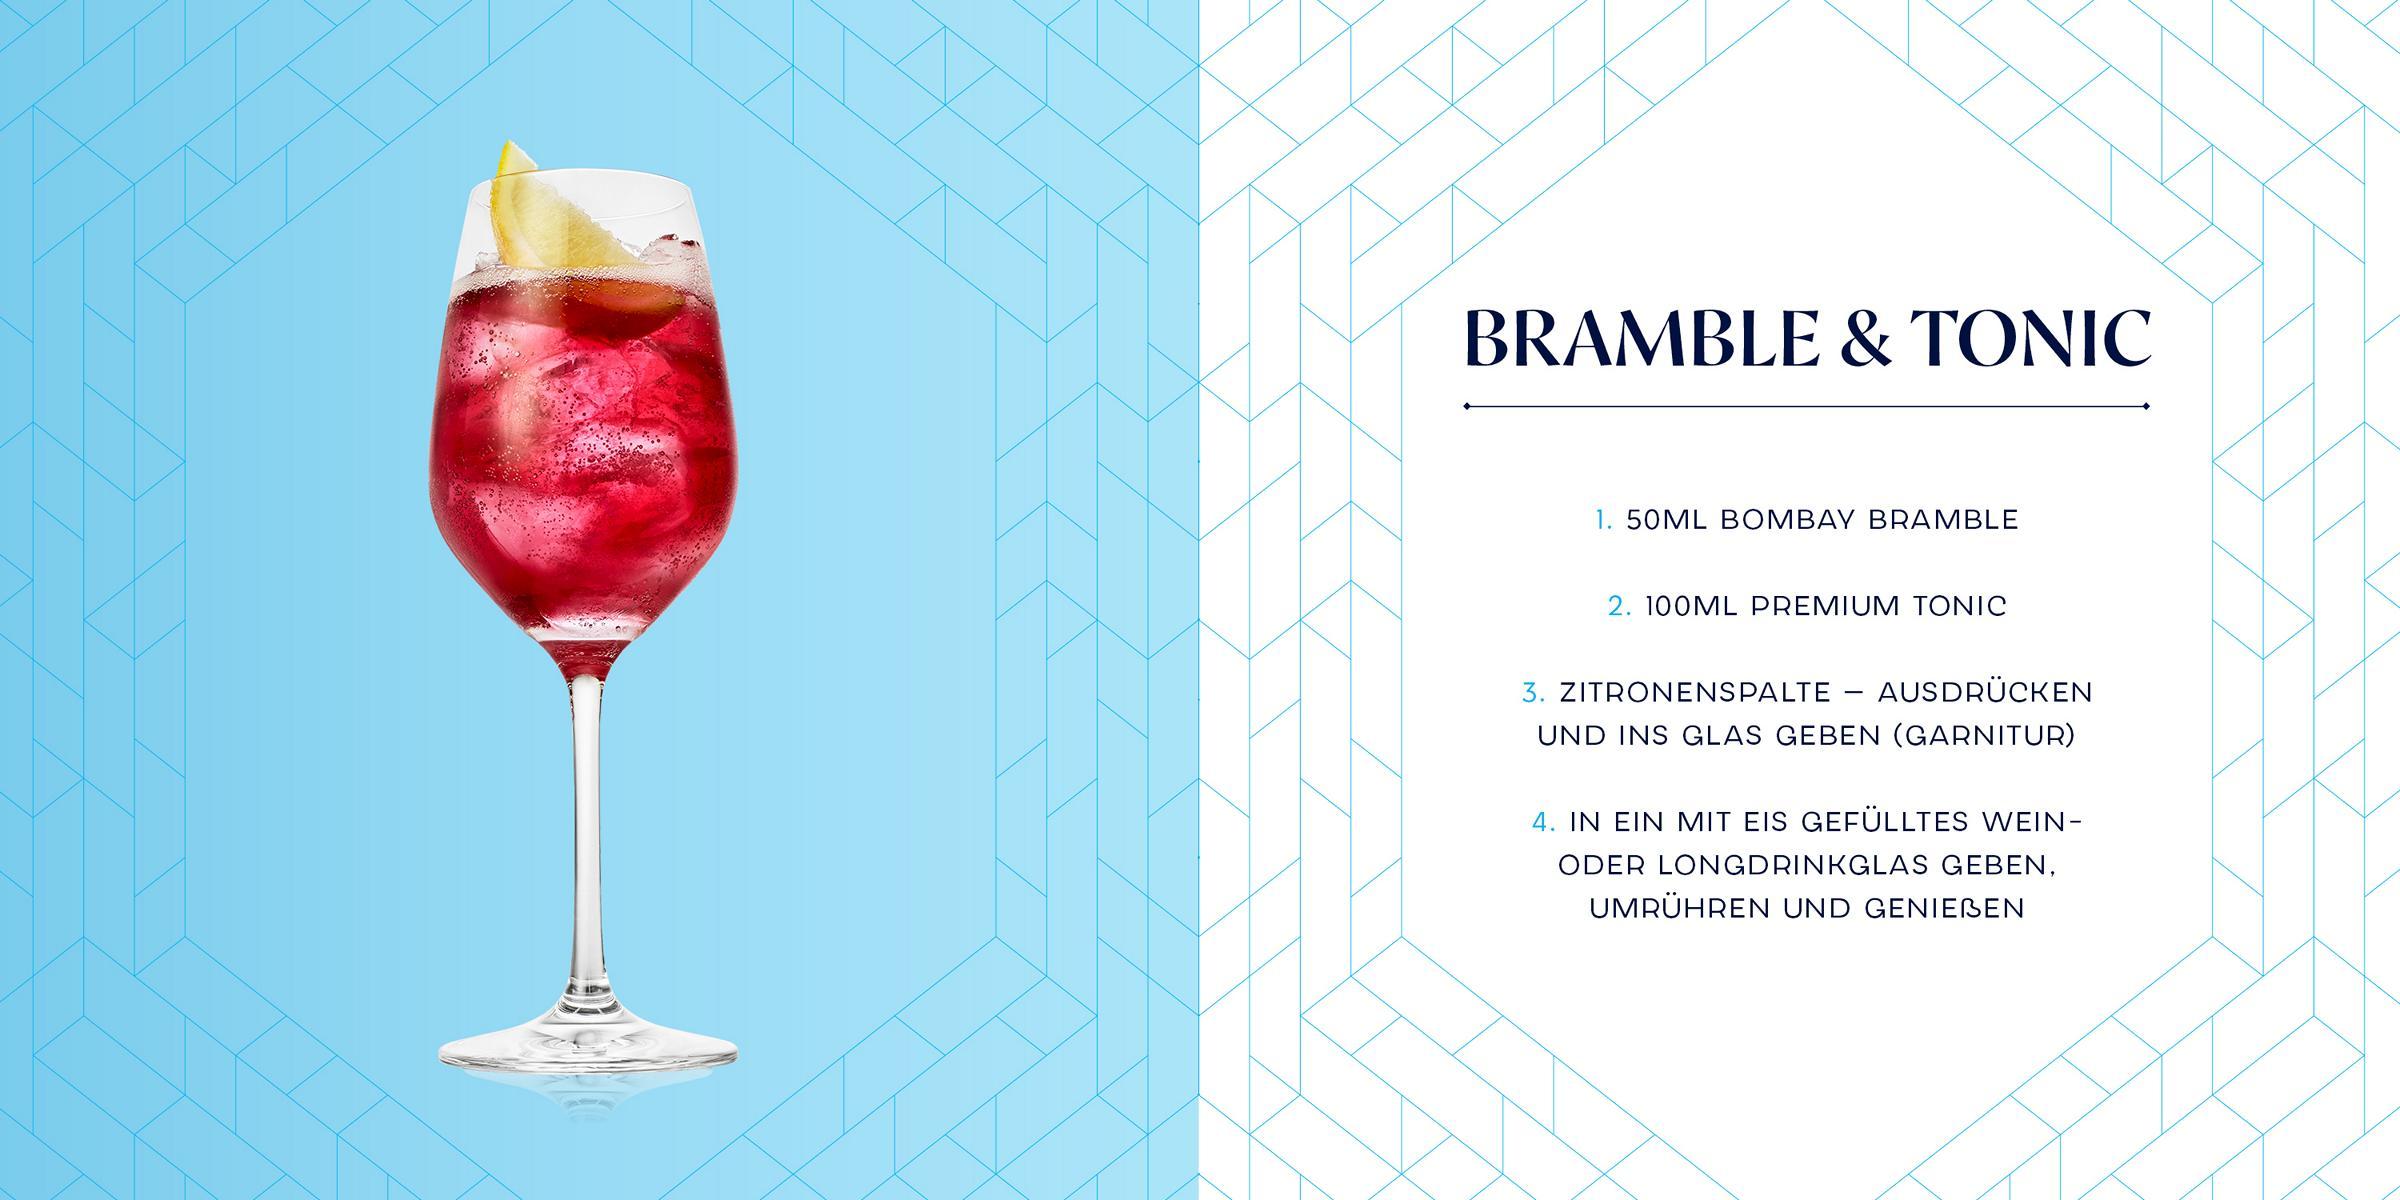 K1600_F20_Bombay_Bramble_Amazon_BrandStore_March_DE_AmazonPanel2